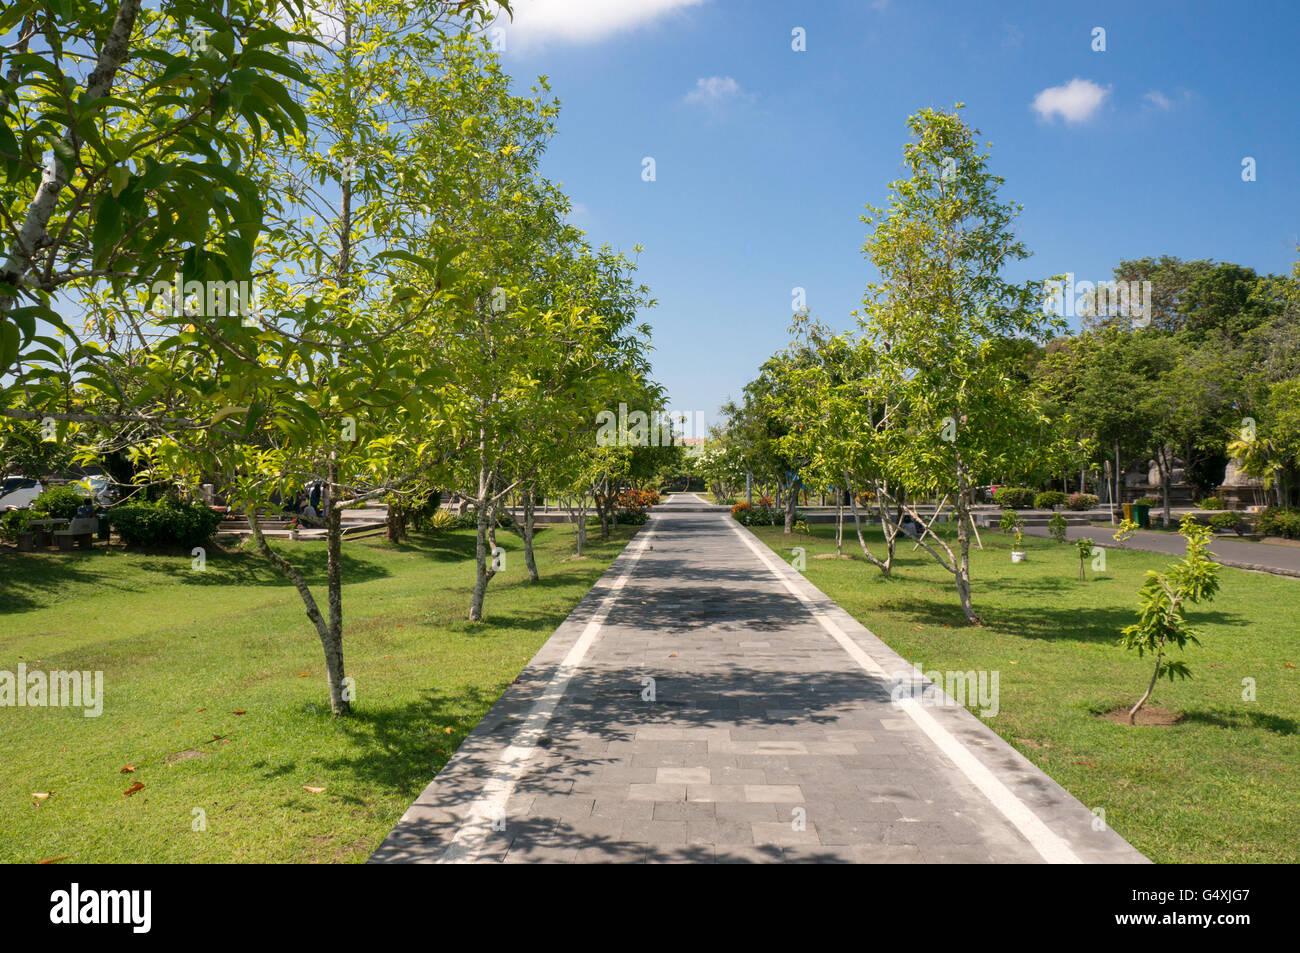 Narrow Path in the Garden around Bajra Sandhi Monument in Denpasar, Bali - Stock Image